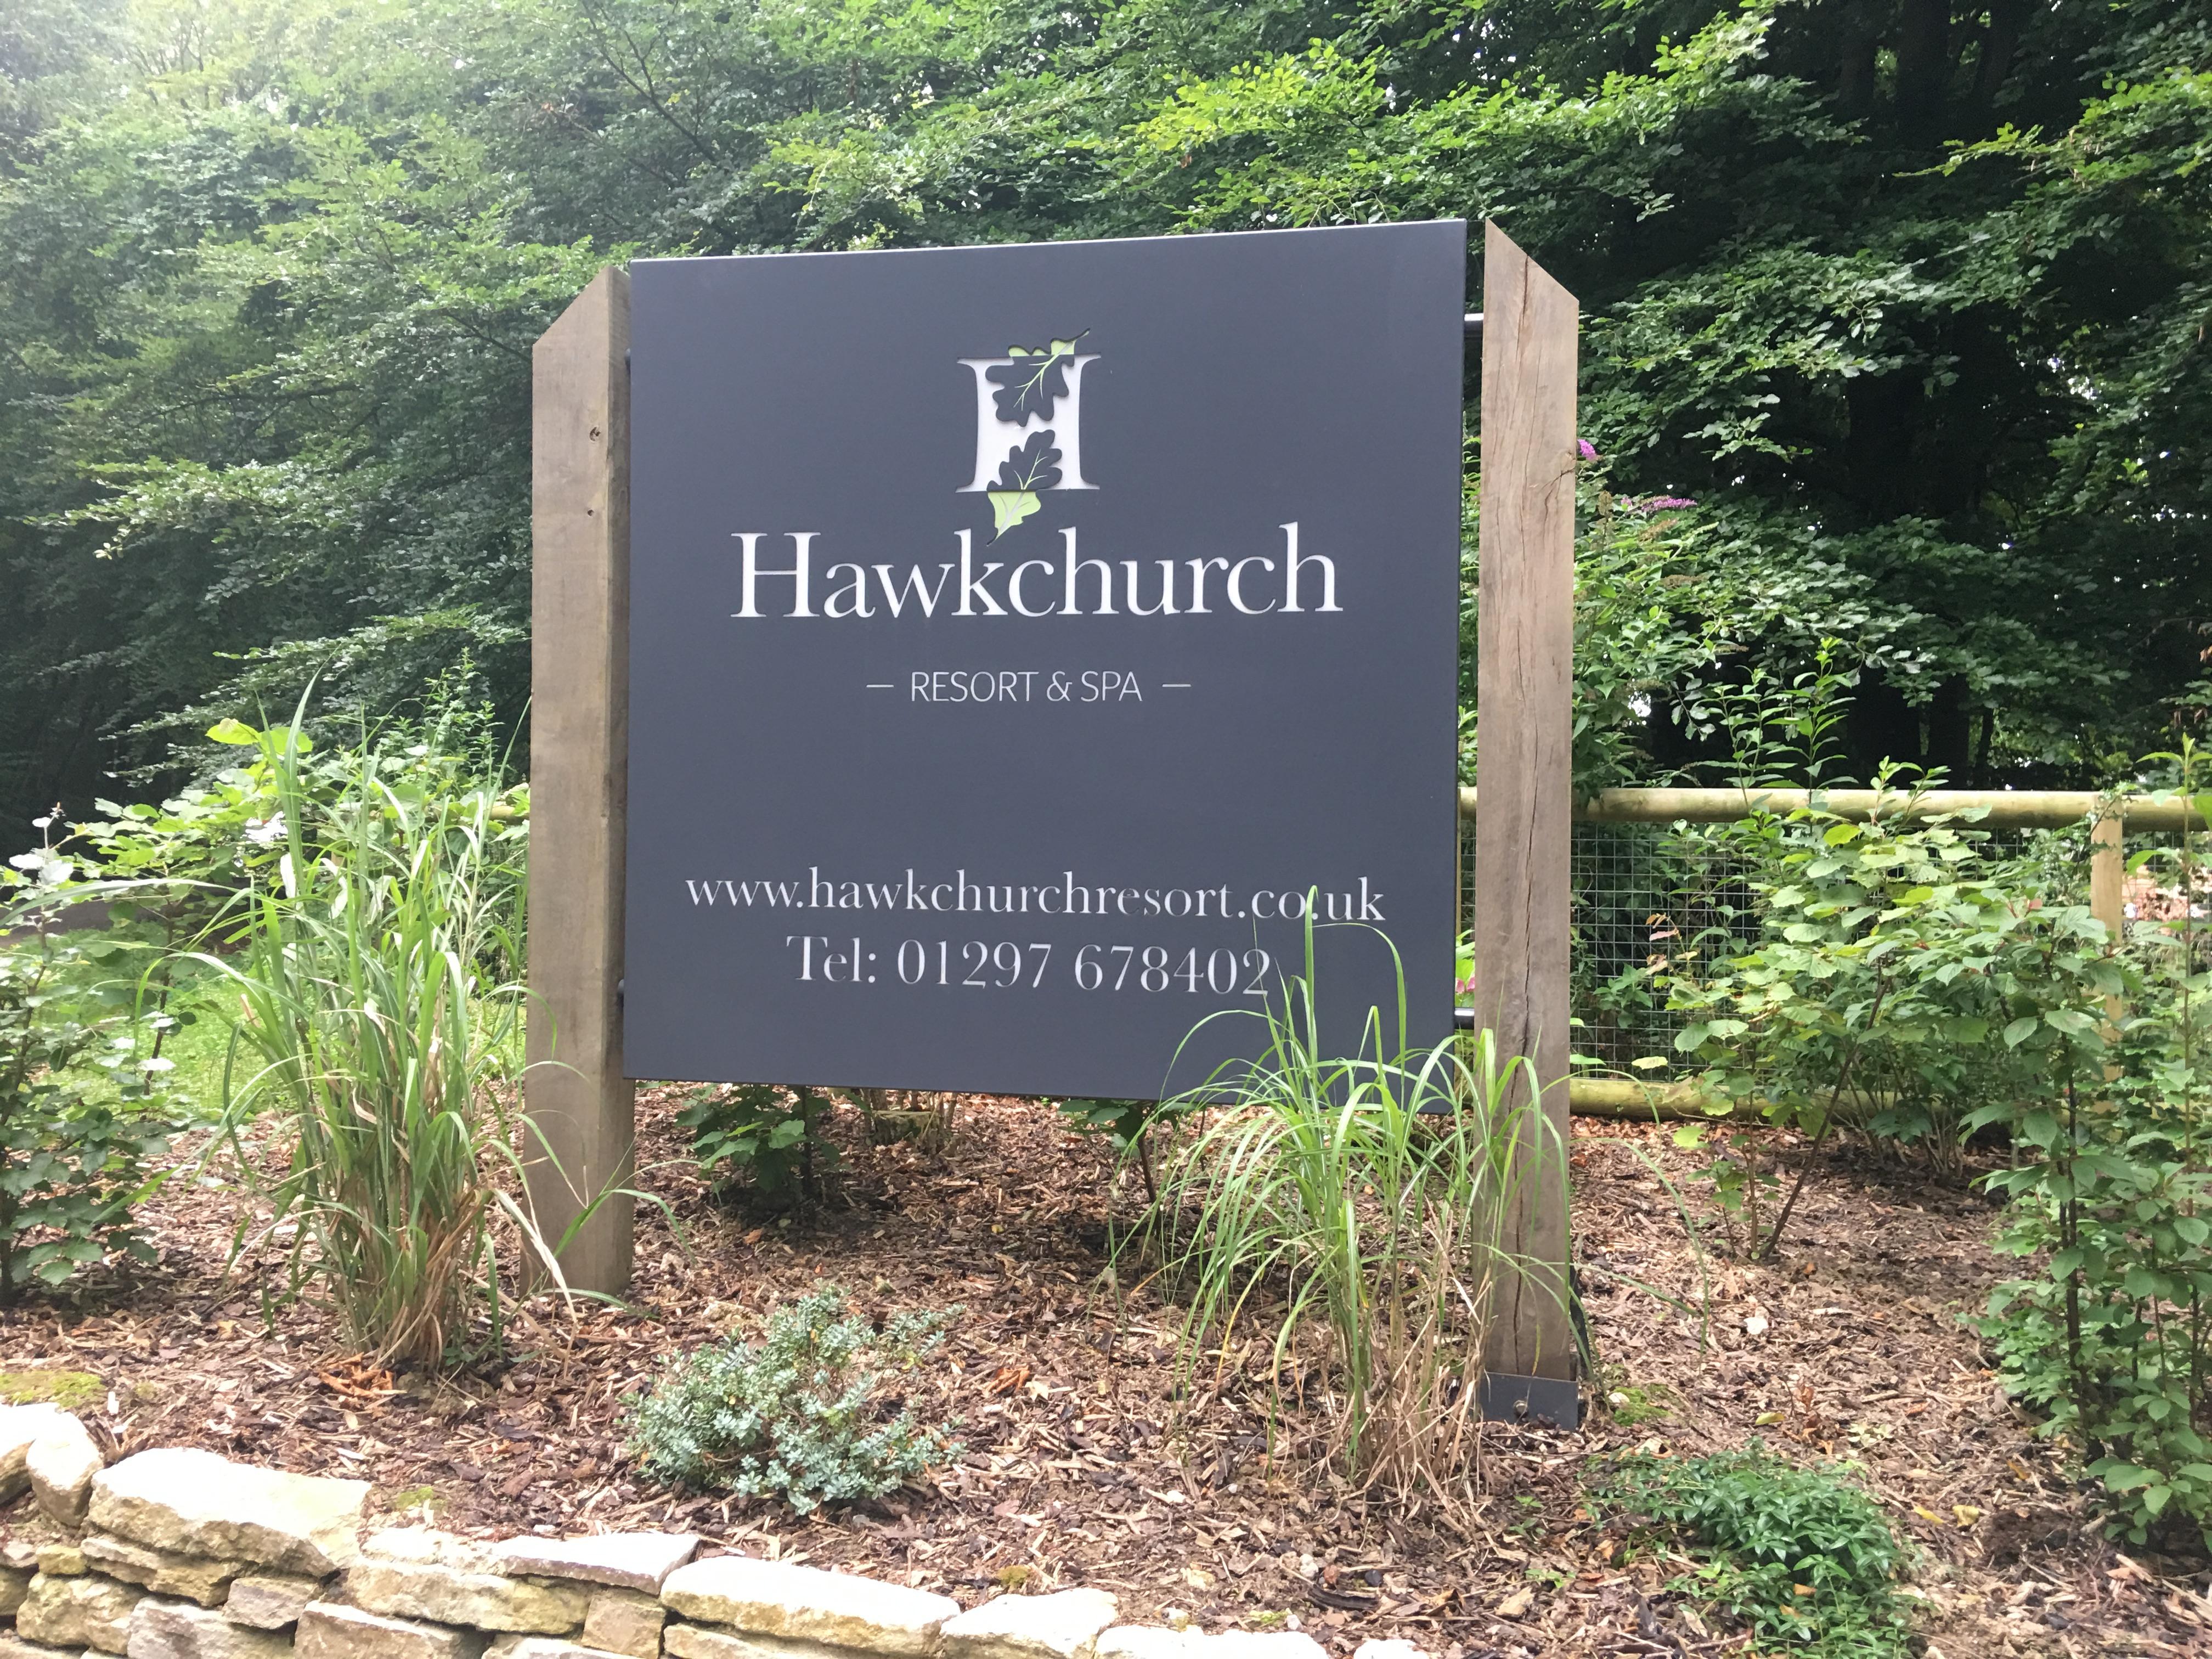 Hawkchurch resort & Spa